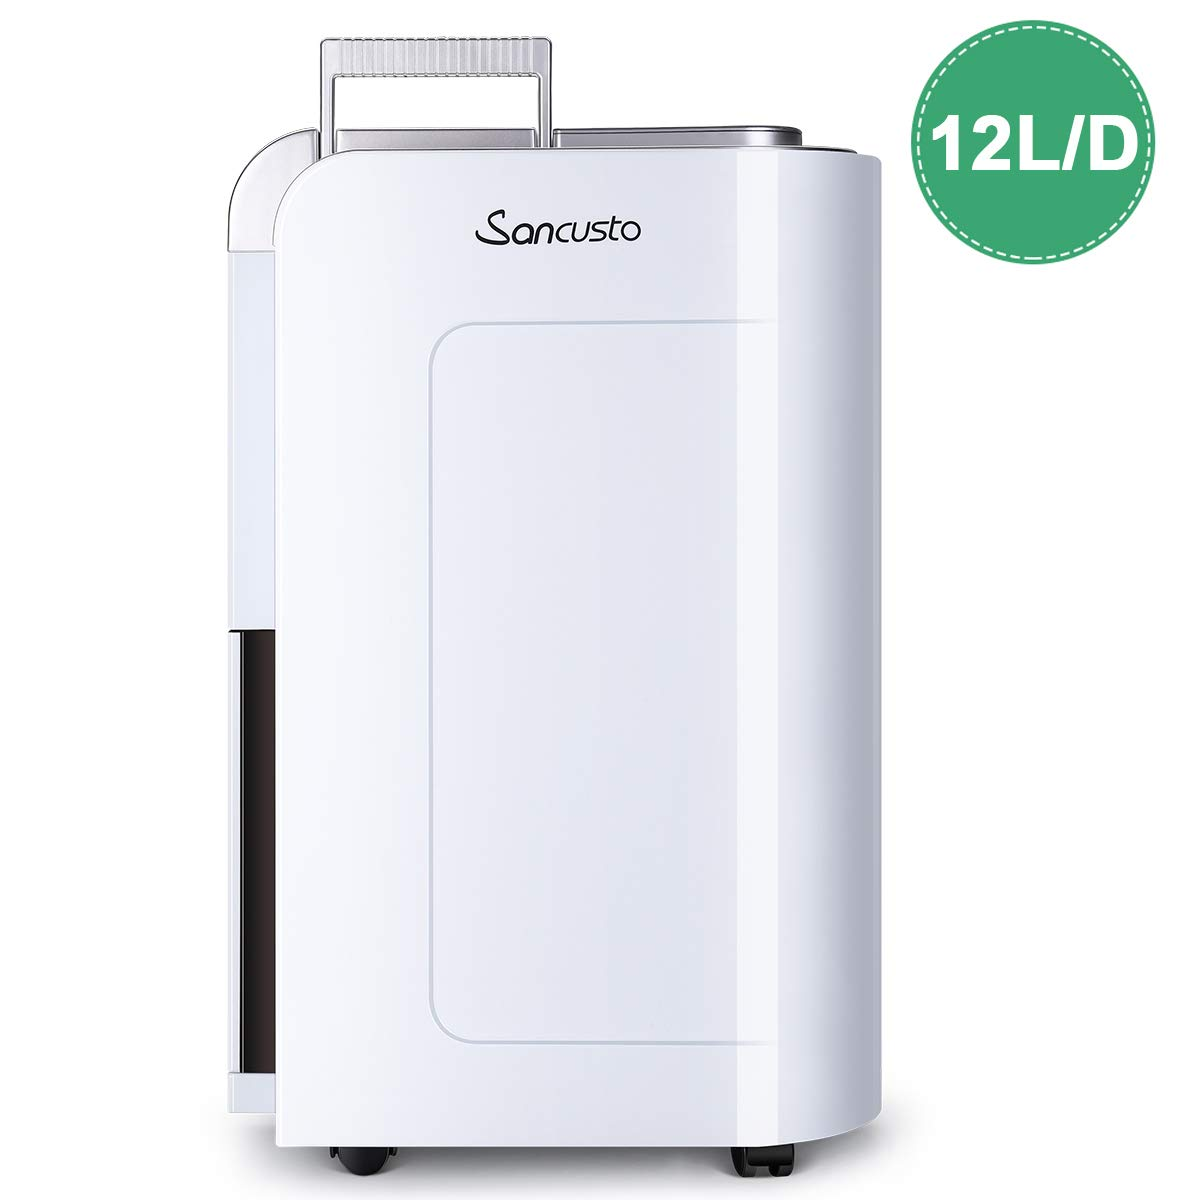 Sancusto® - 12L/Día Deshumidificador Digital, Secador Purificador de Aire, 12L/